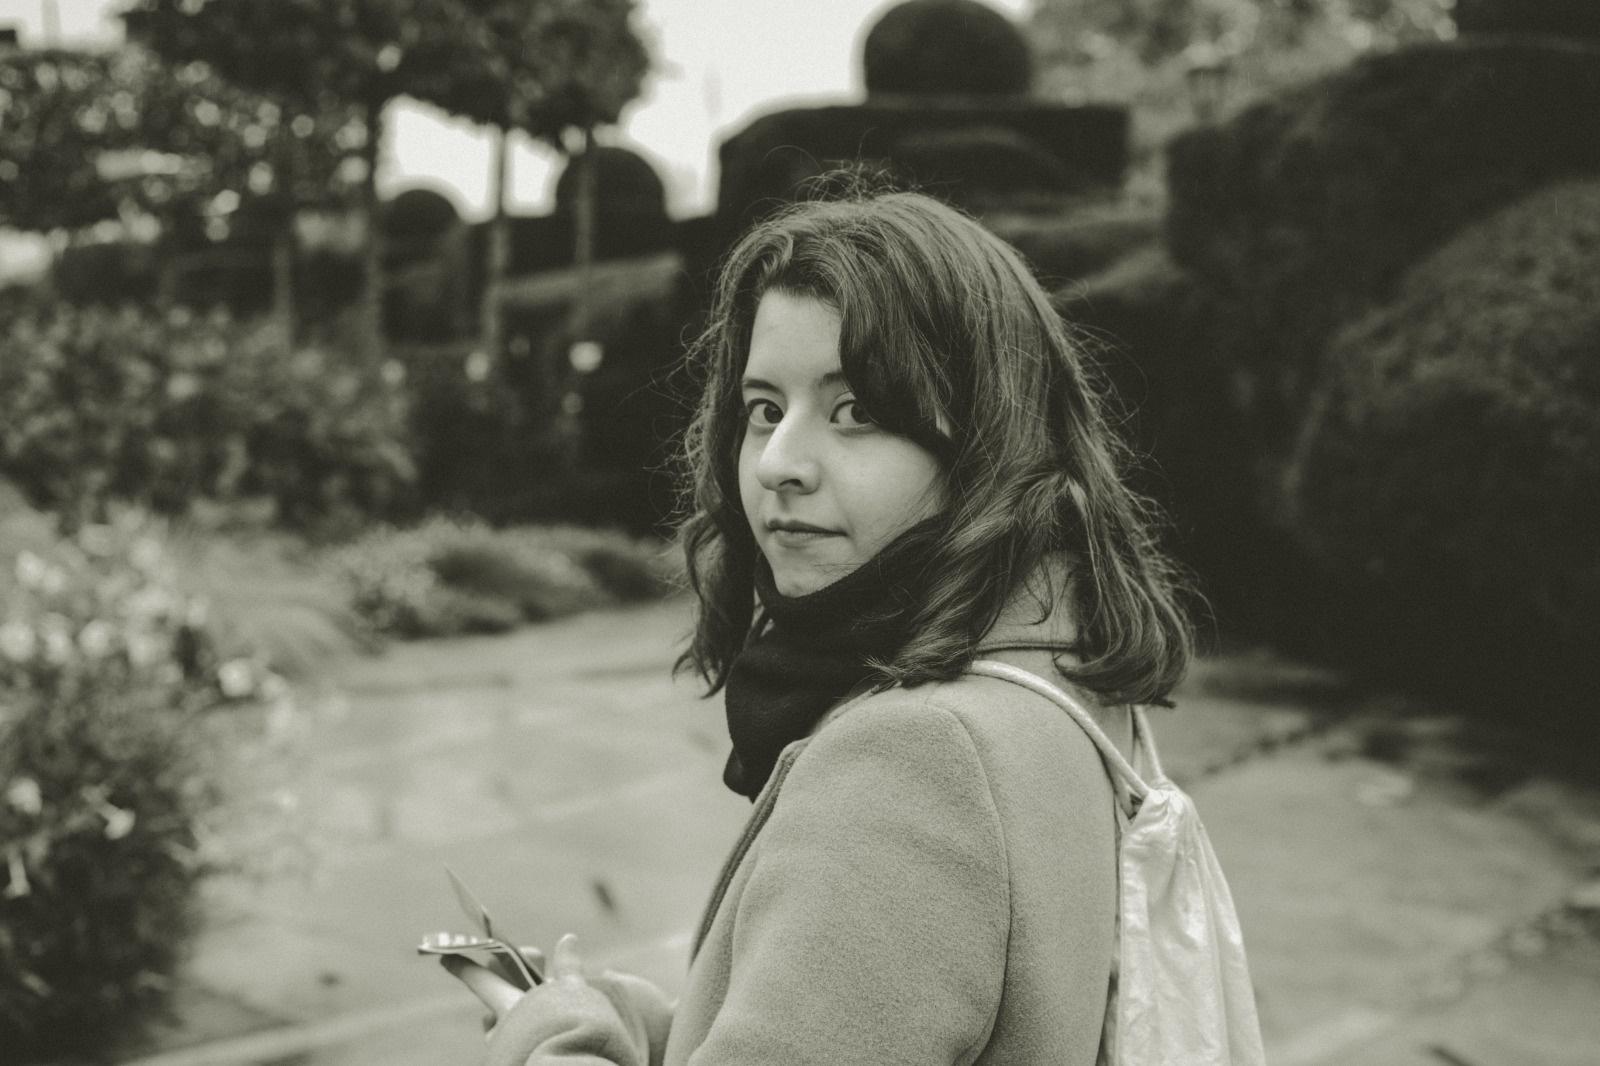 Mónica Galindo